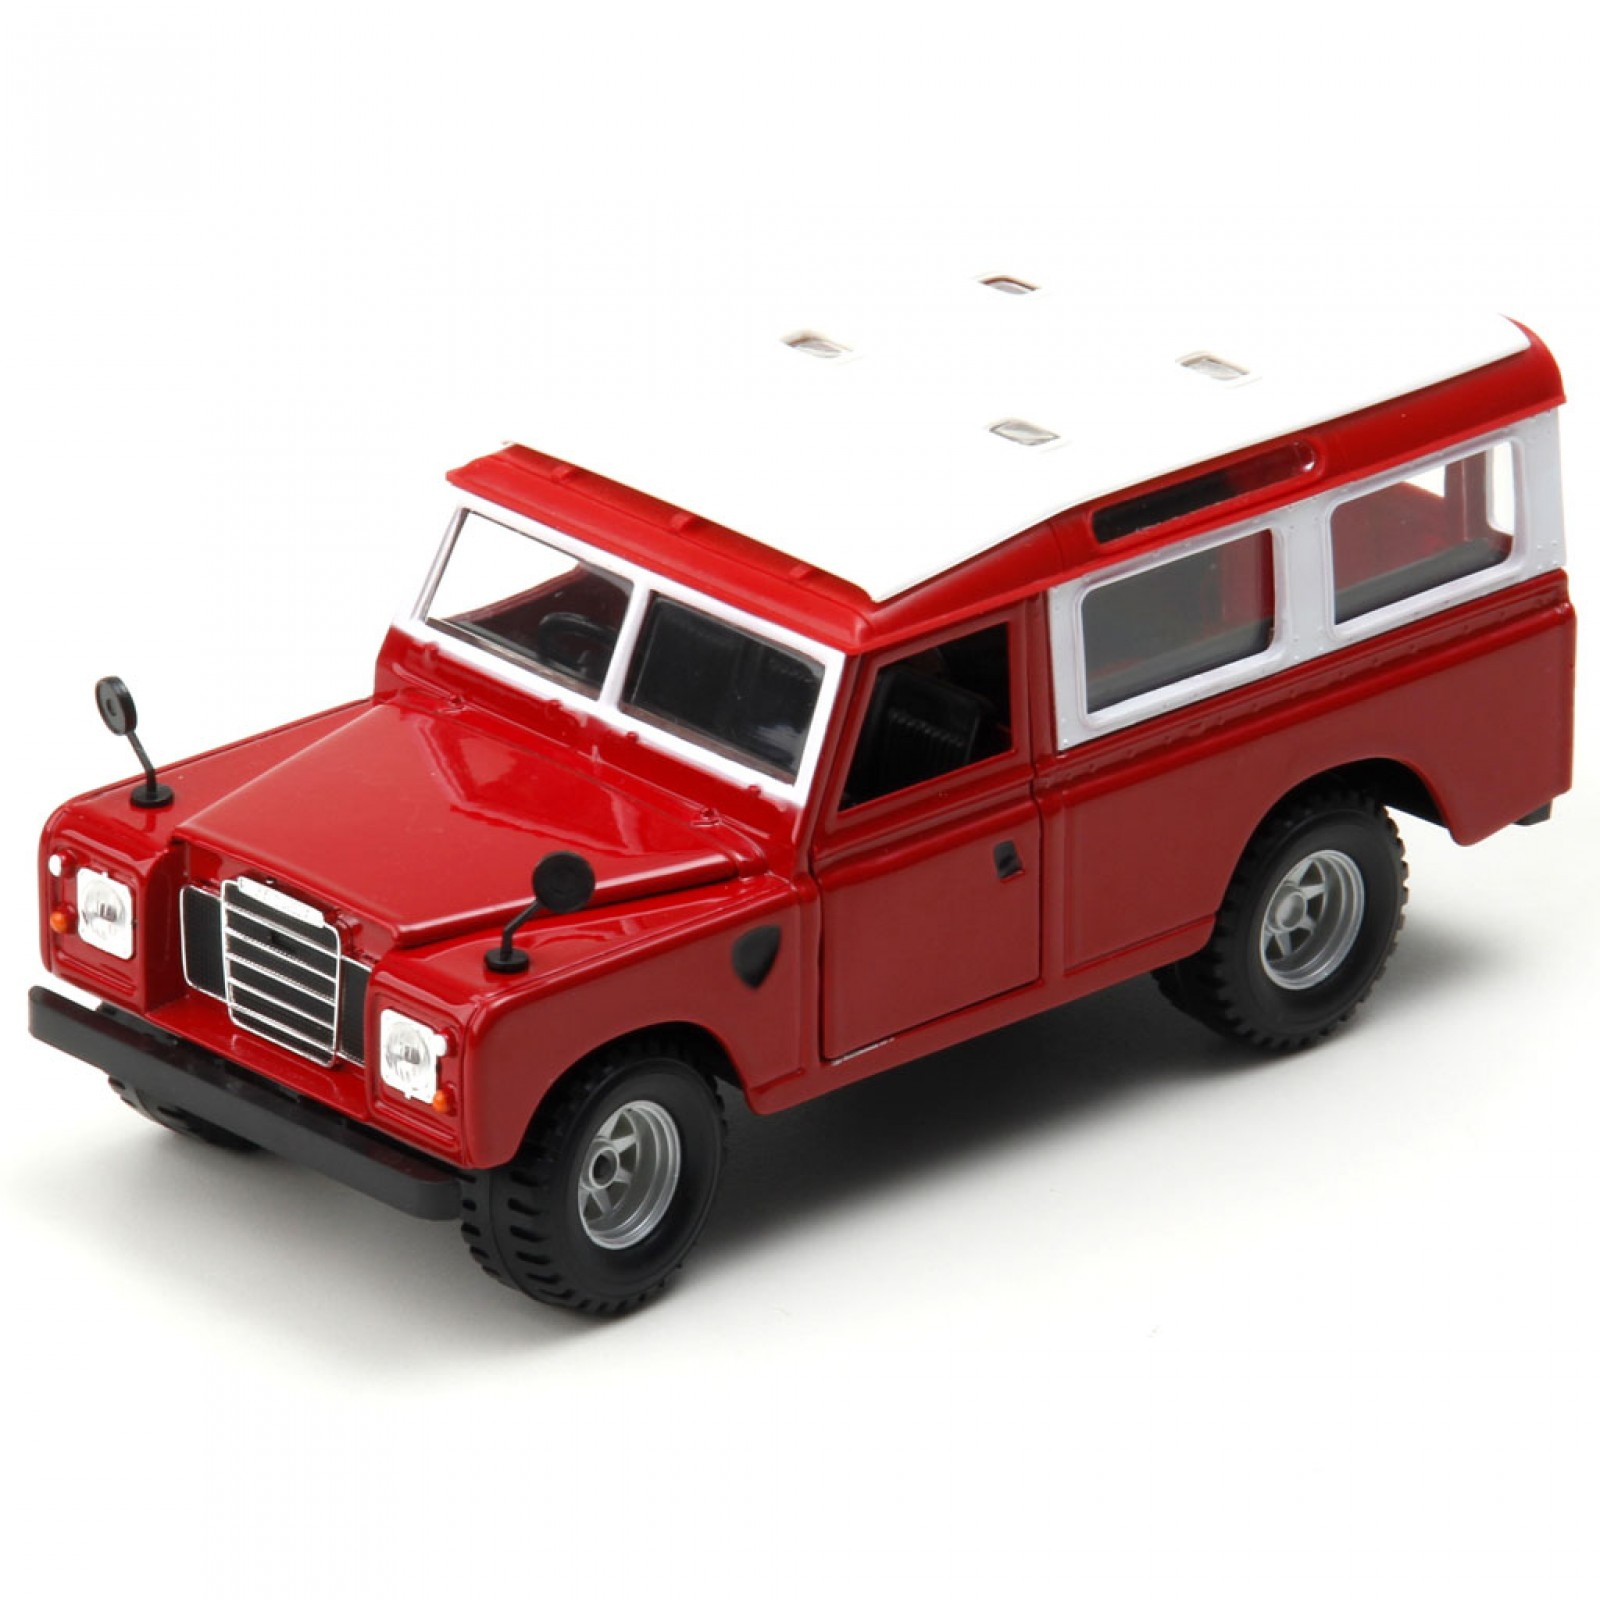 Miniatura em Metal - 1:24 - Land Rover Defender Series